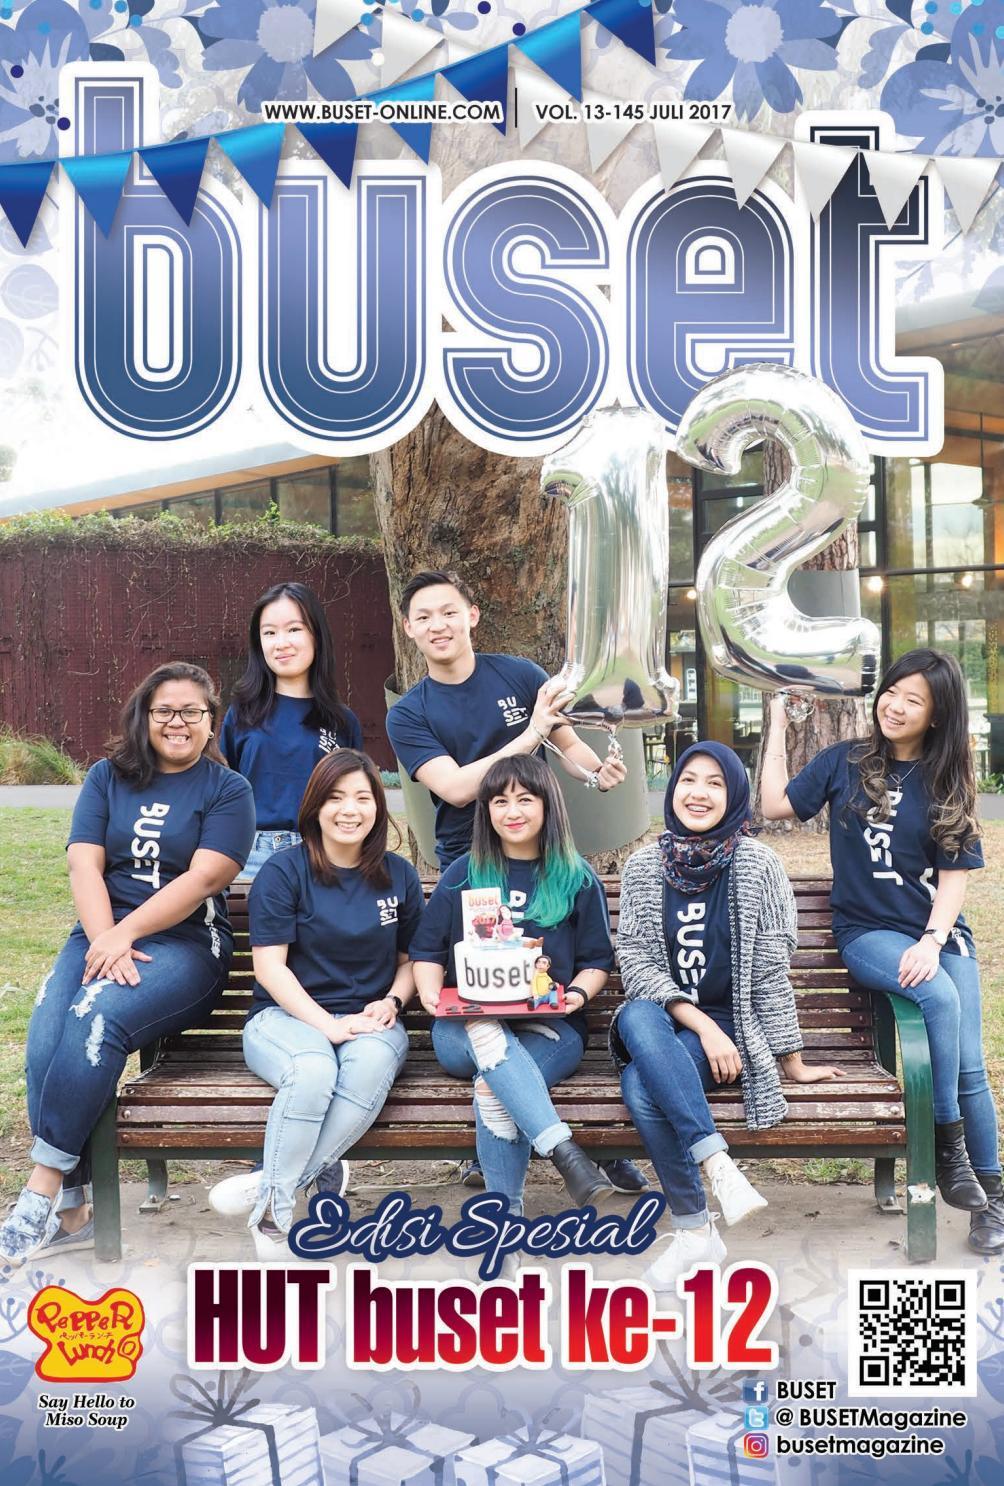 BUSET Vol 13 145 JULY 2017 By BUSET Bukan Sembarang Tabloid